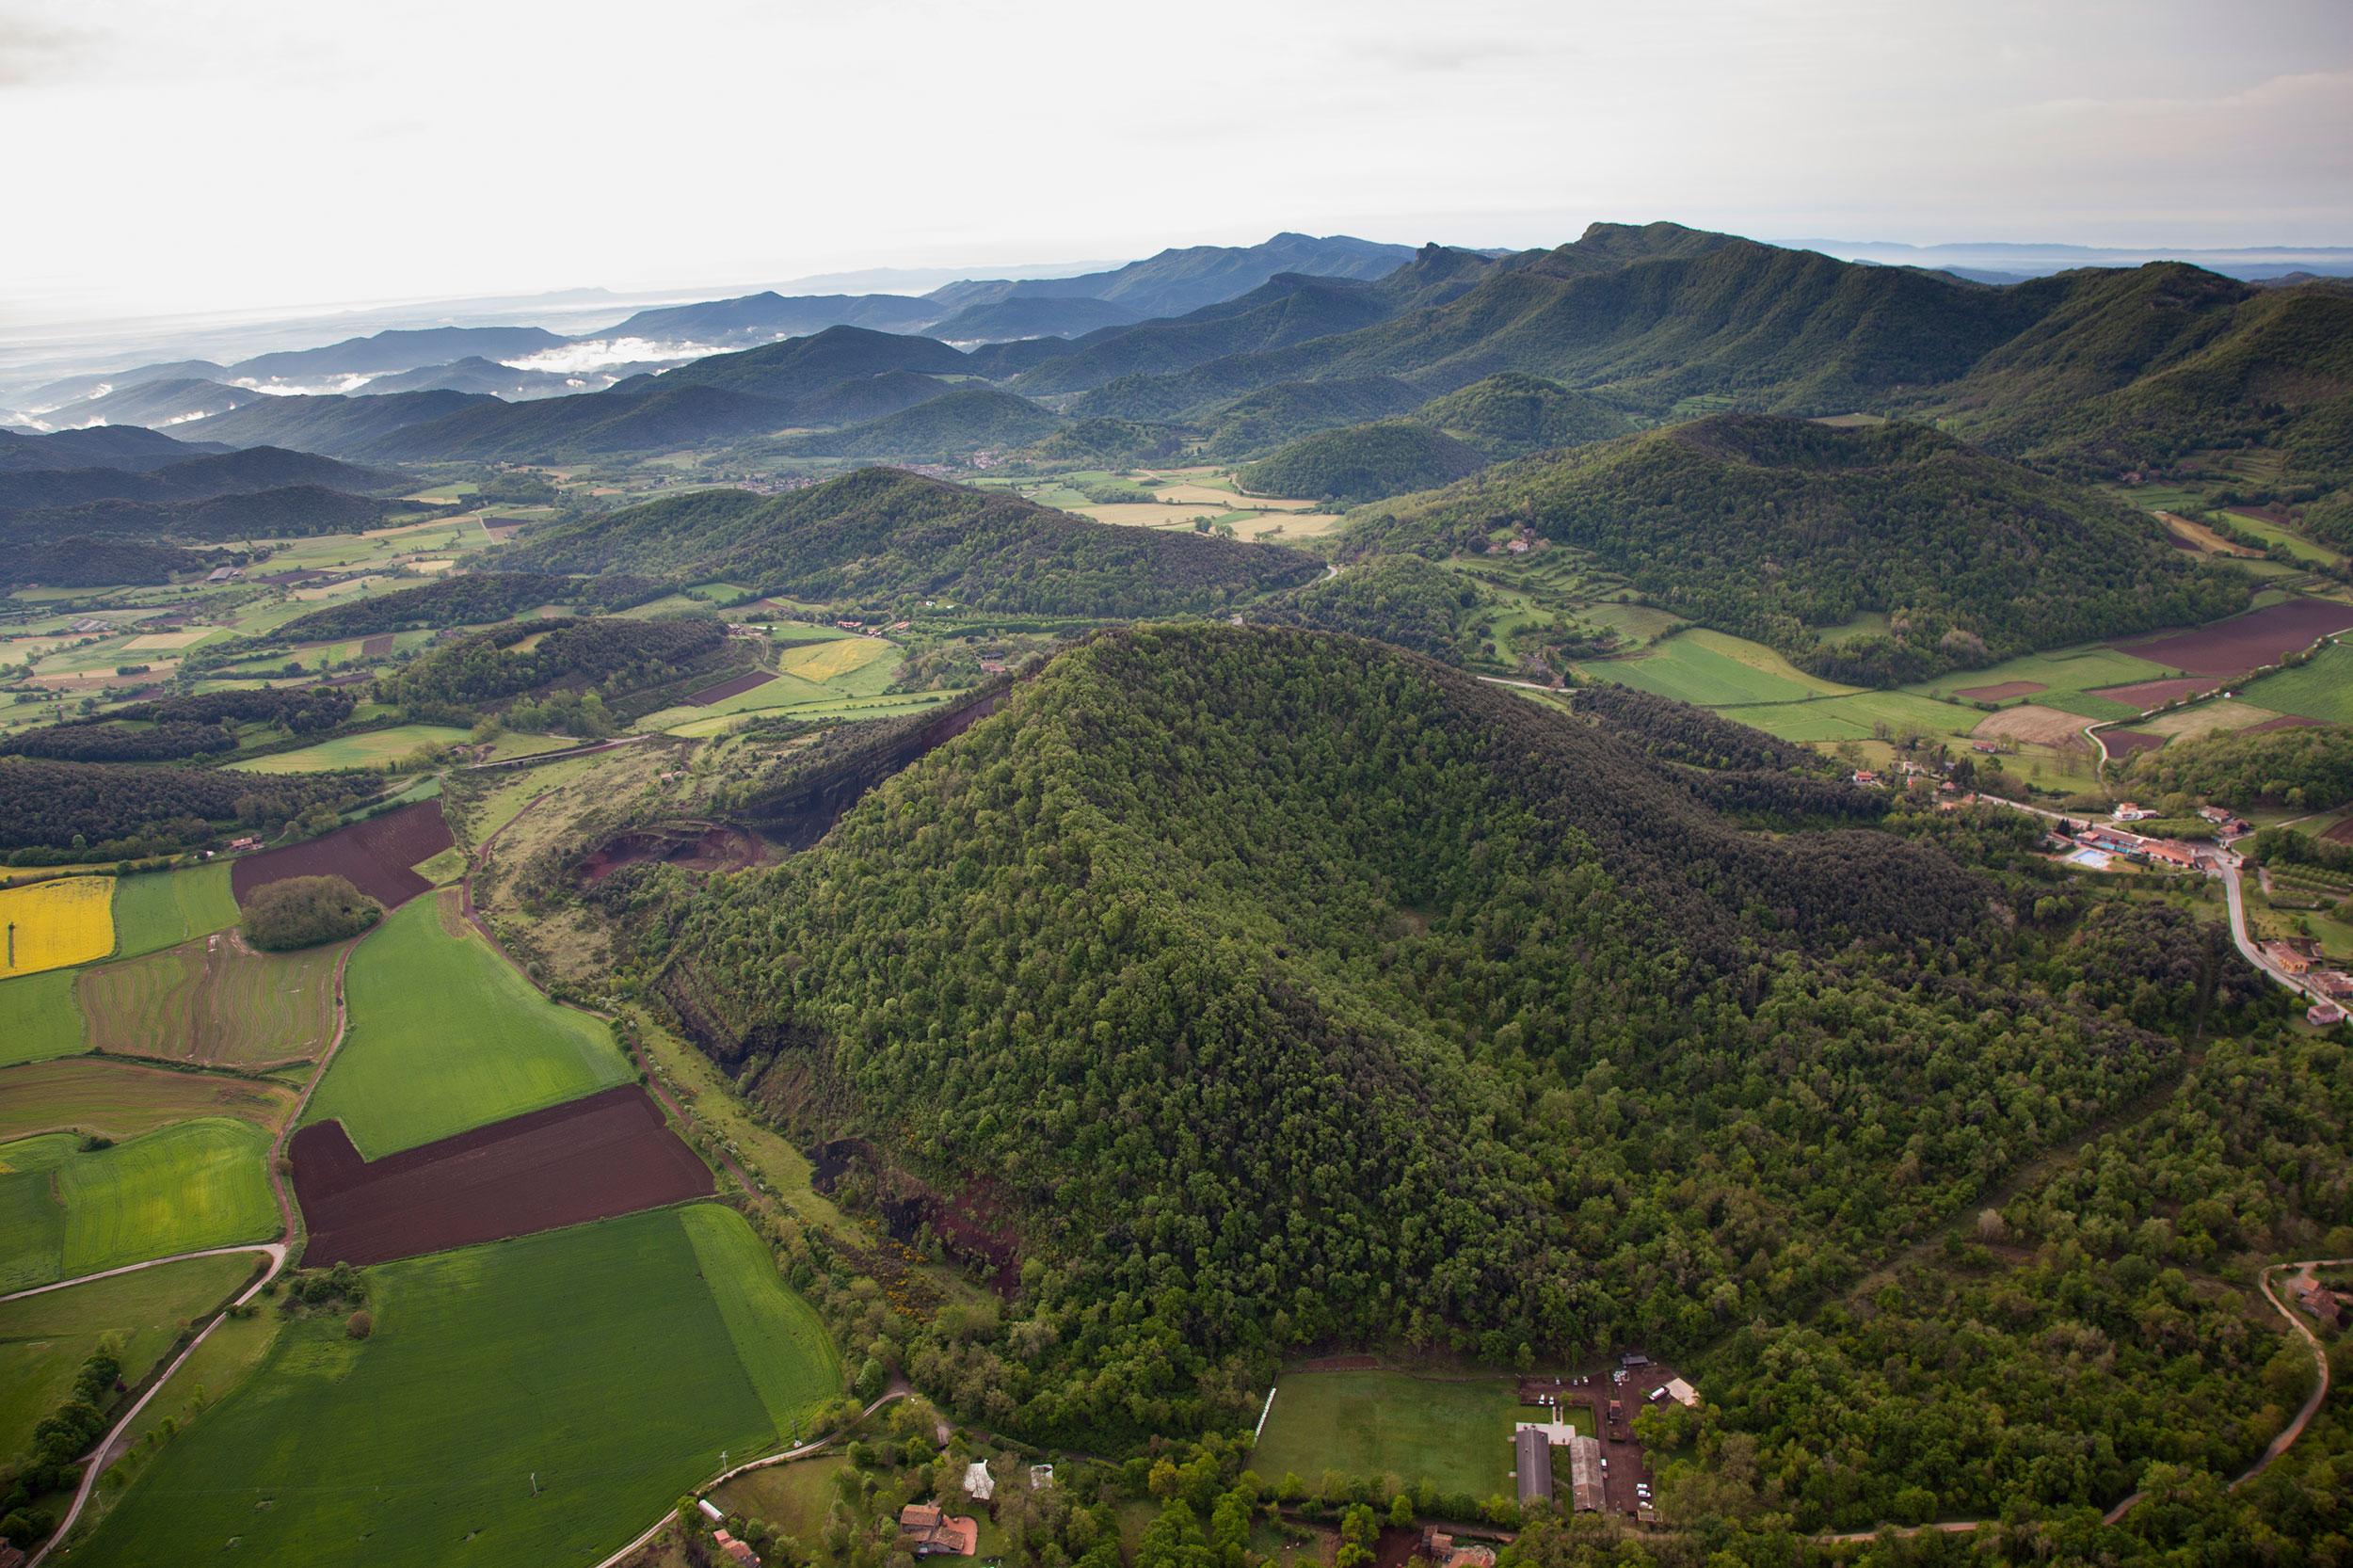 Le Parc Naturel de la Zone Volcanique de la Garrotxa